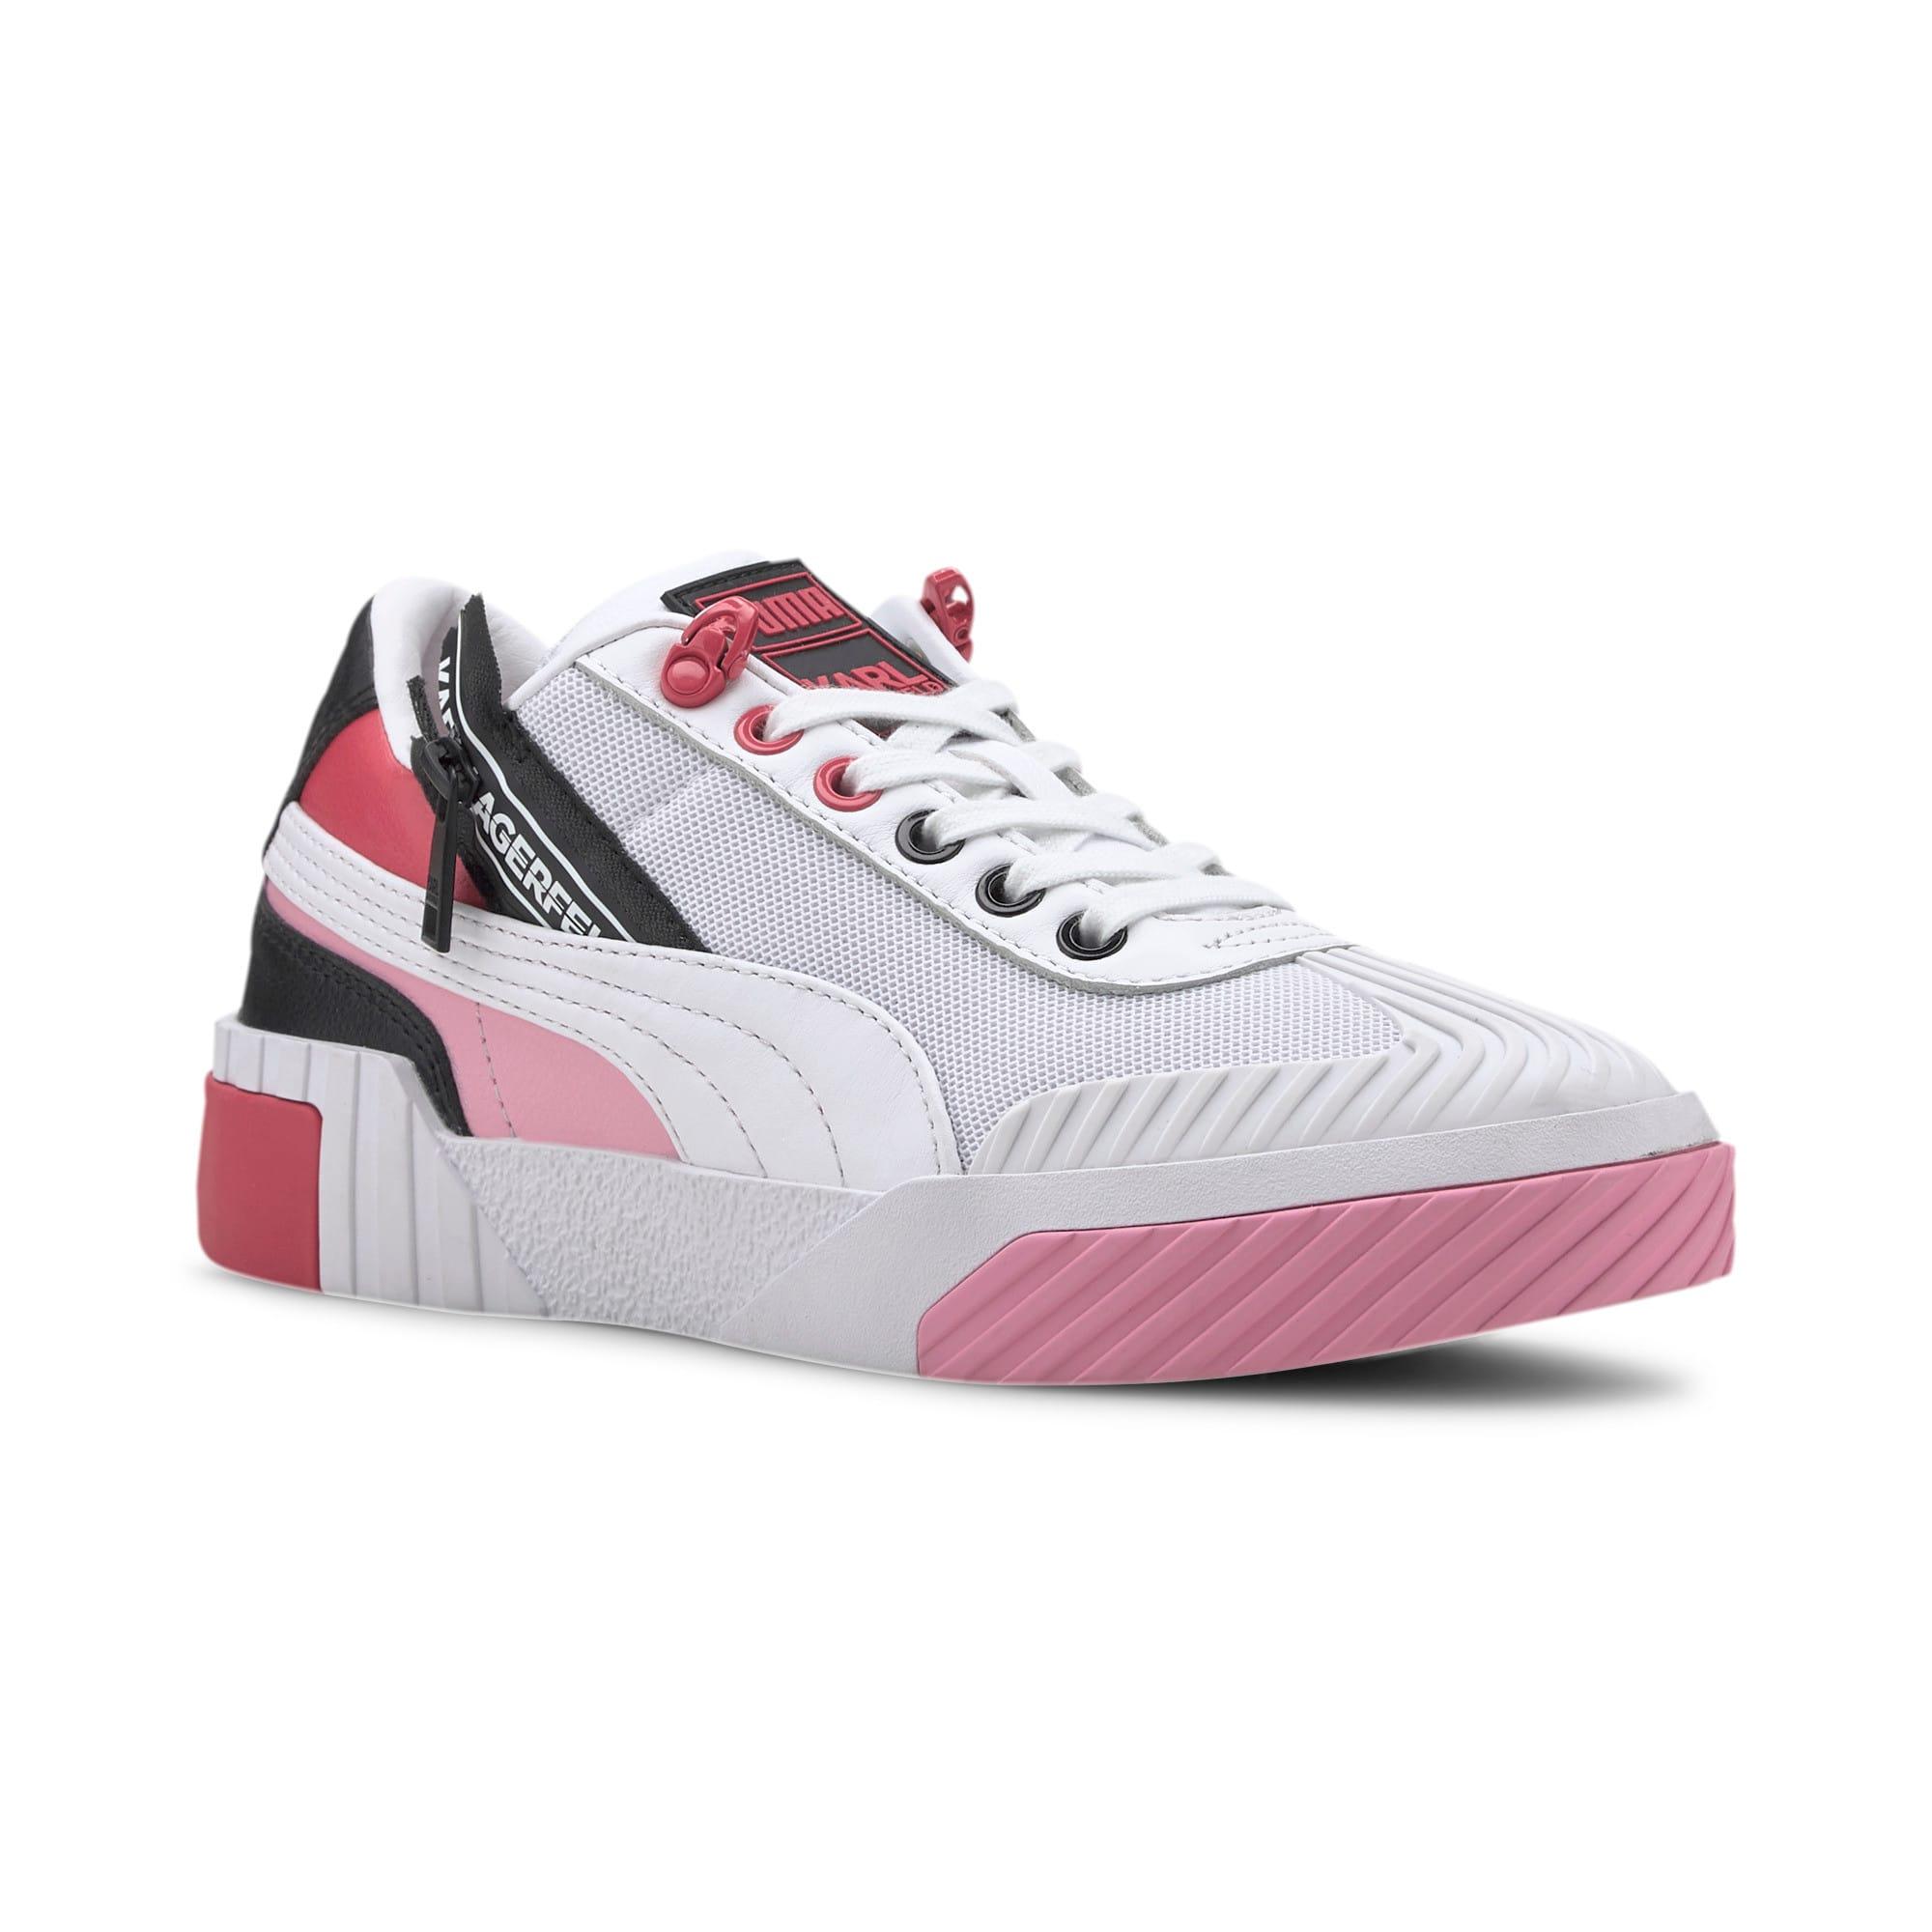 Thumbnail 9 of PUMA x KARL LAGERFELD Cali Women's Training Shoes, Puma White-PRISM PINK, medium